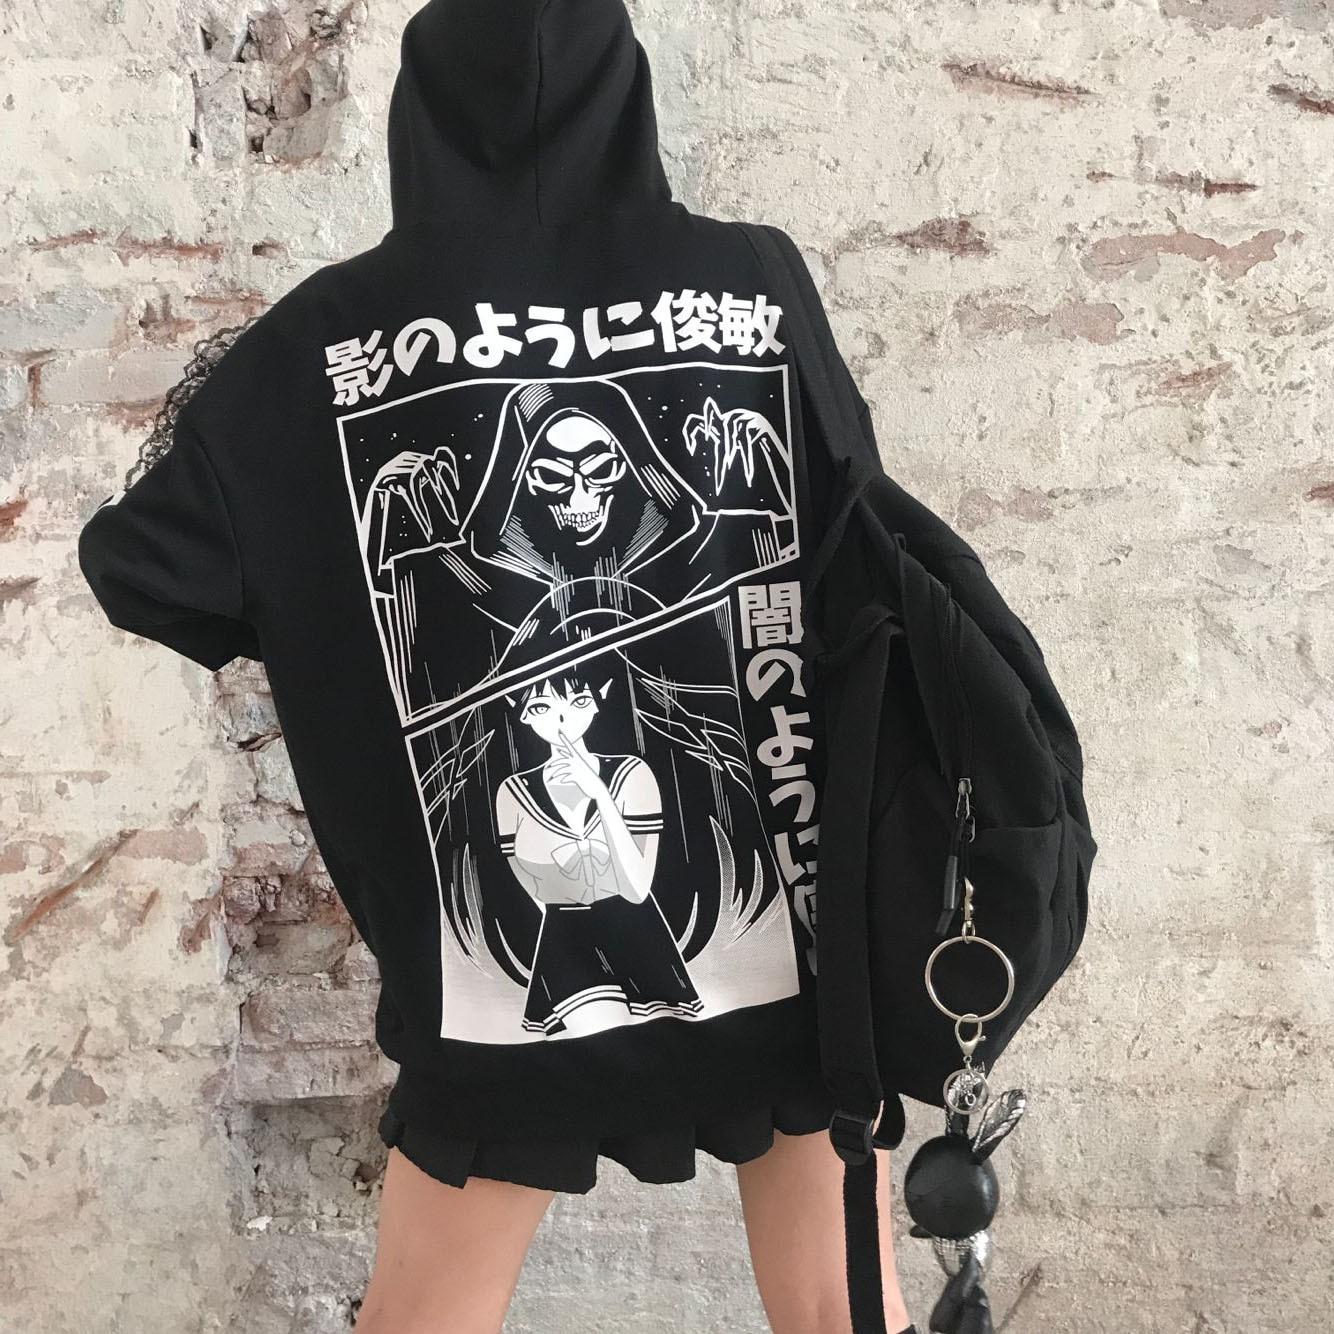 Loose Punk Style Harajuku Japanese Letter Printed Sweatshirts Female Anime Print Hooded Casual Hoodies Women Girls Pullovers